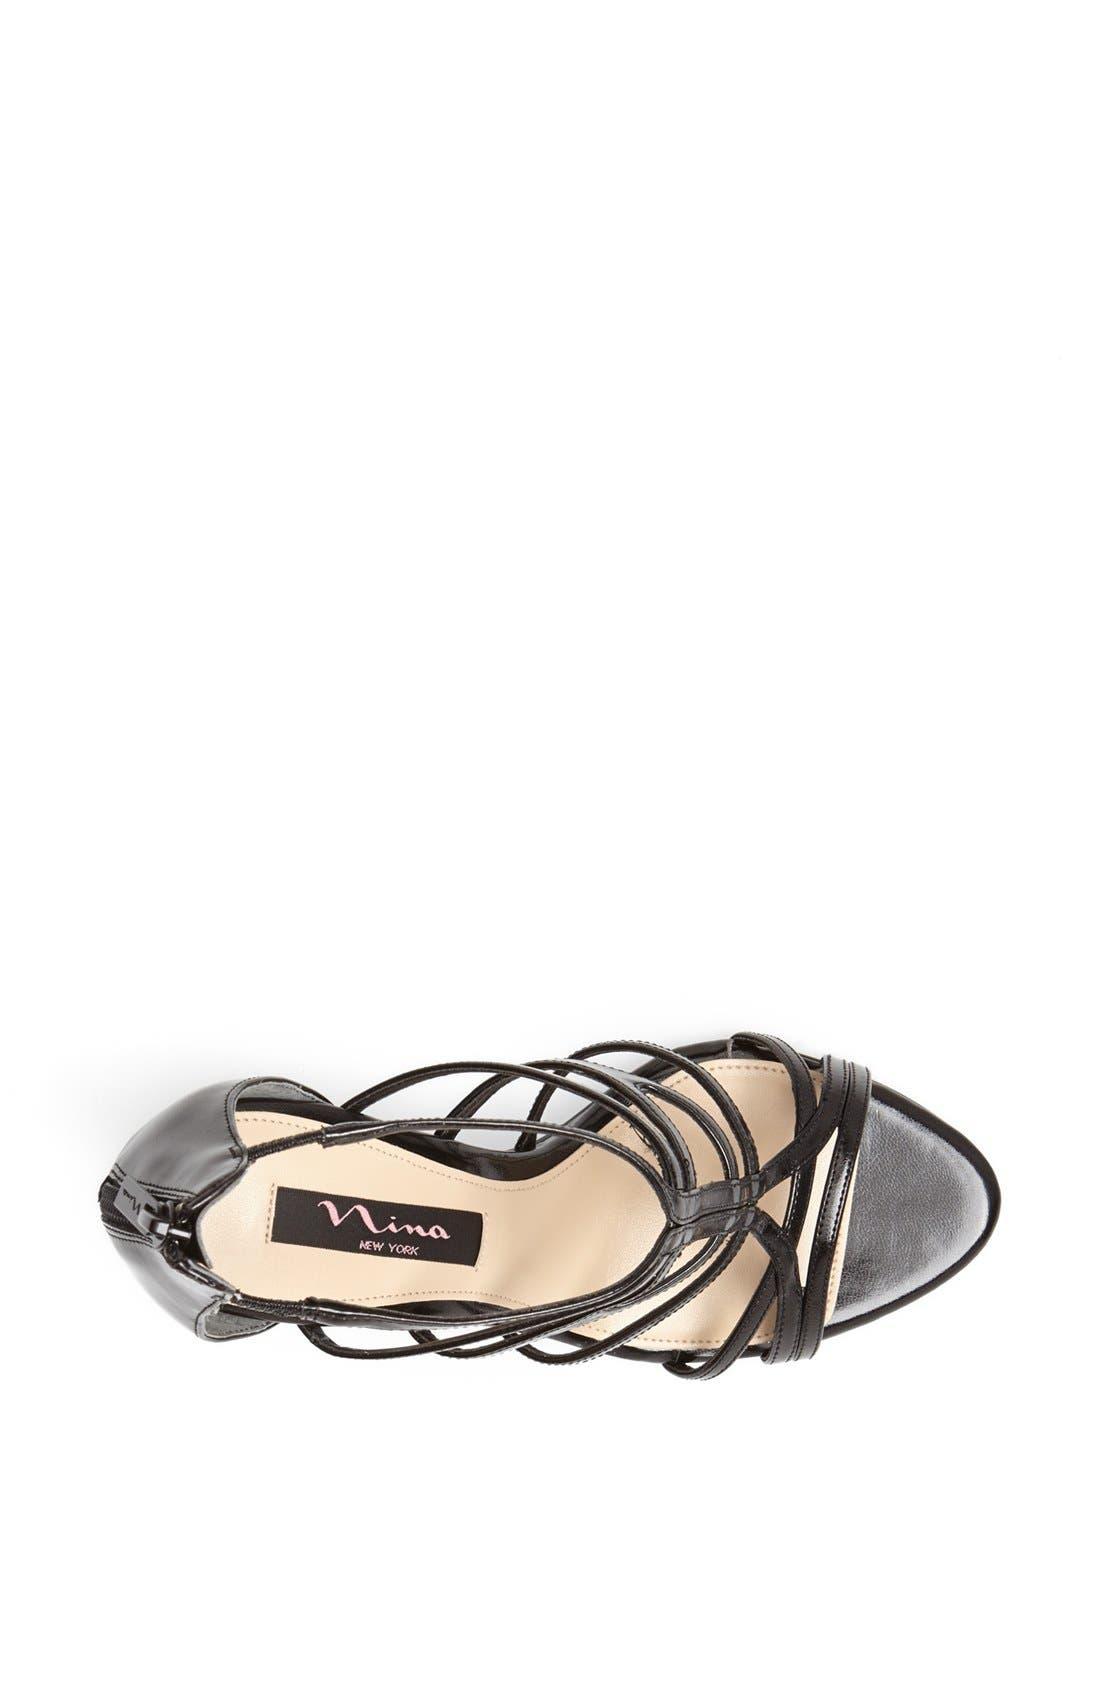 NINA,                             'Marisol' Glittering Cage Strap Sandal,                             Alternate thumbnail 4, color,                             006